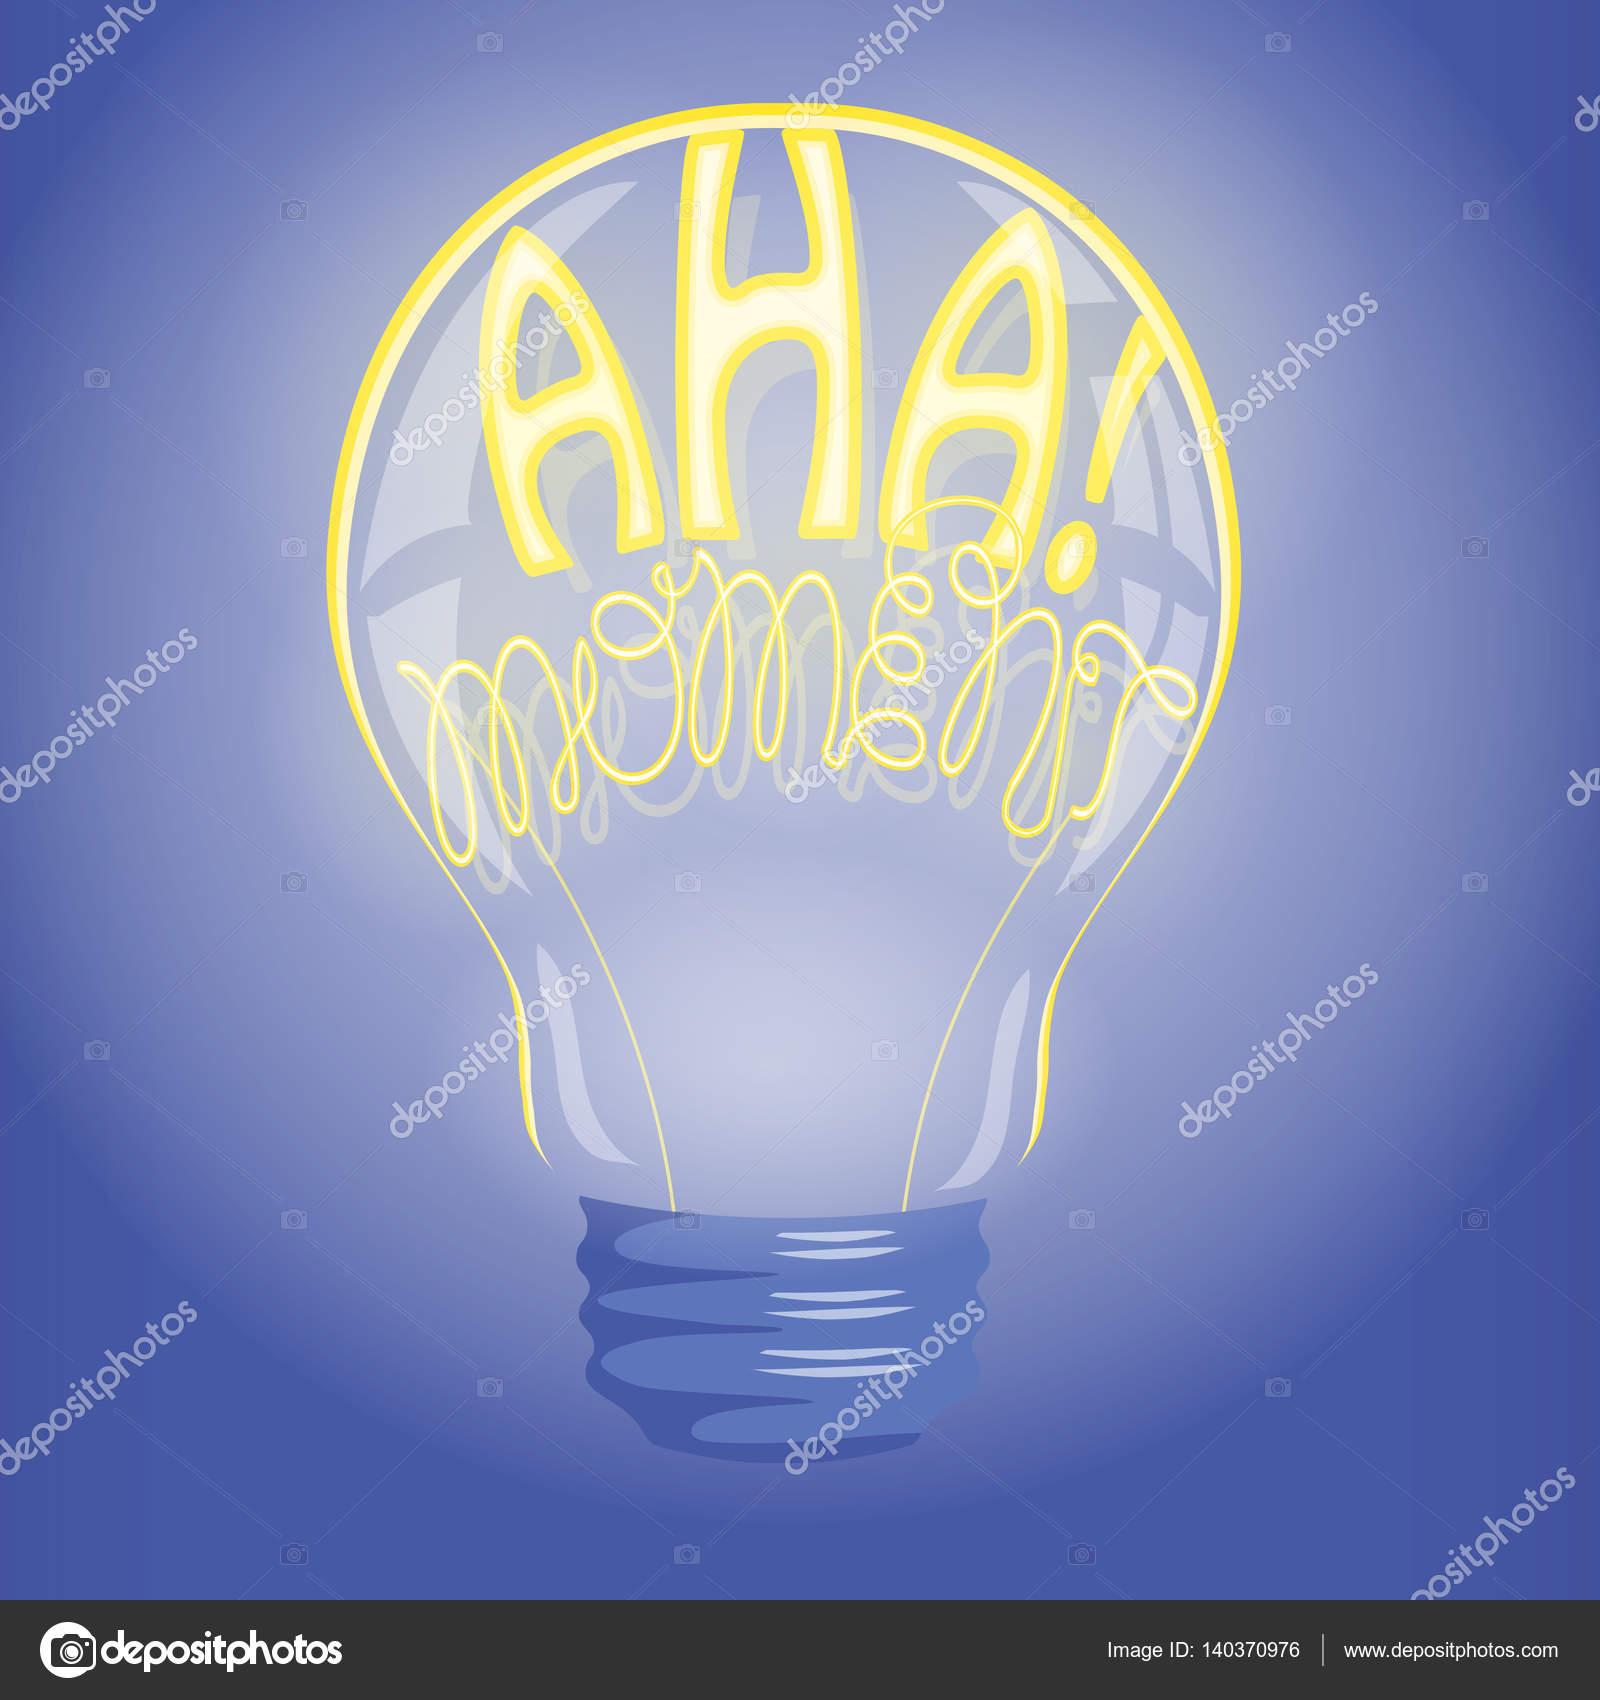 My AHA! moment » Facing My Mortality